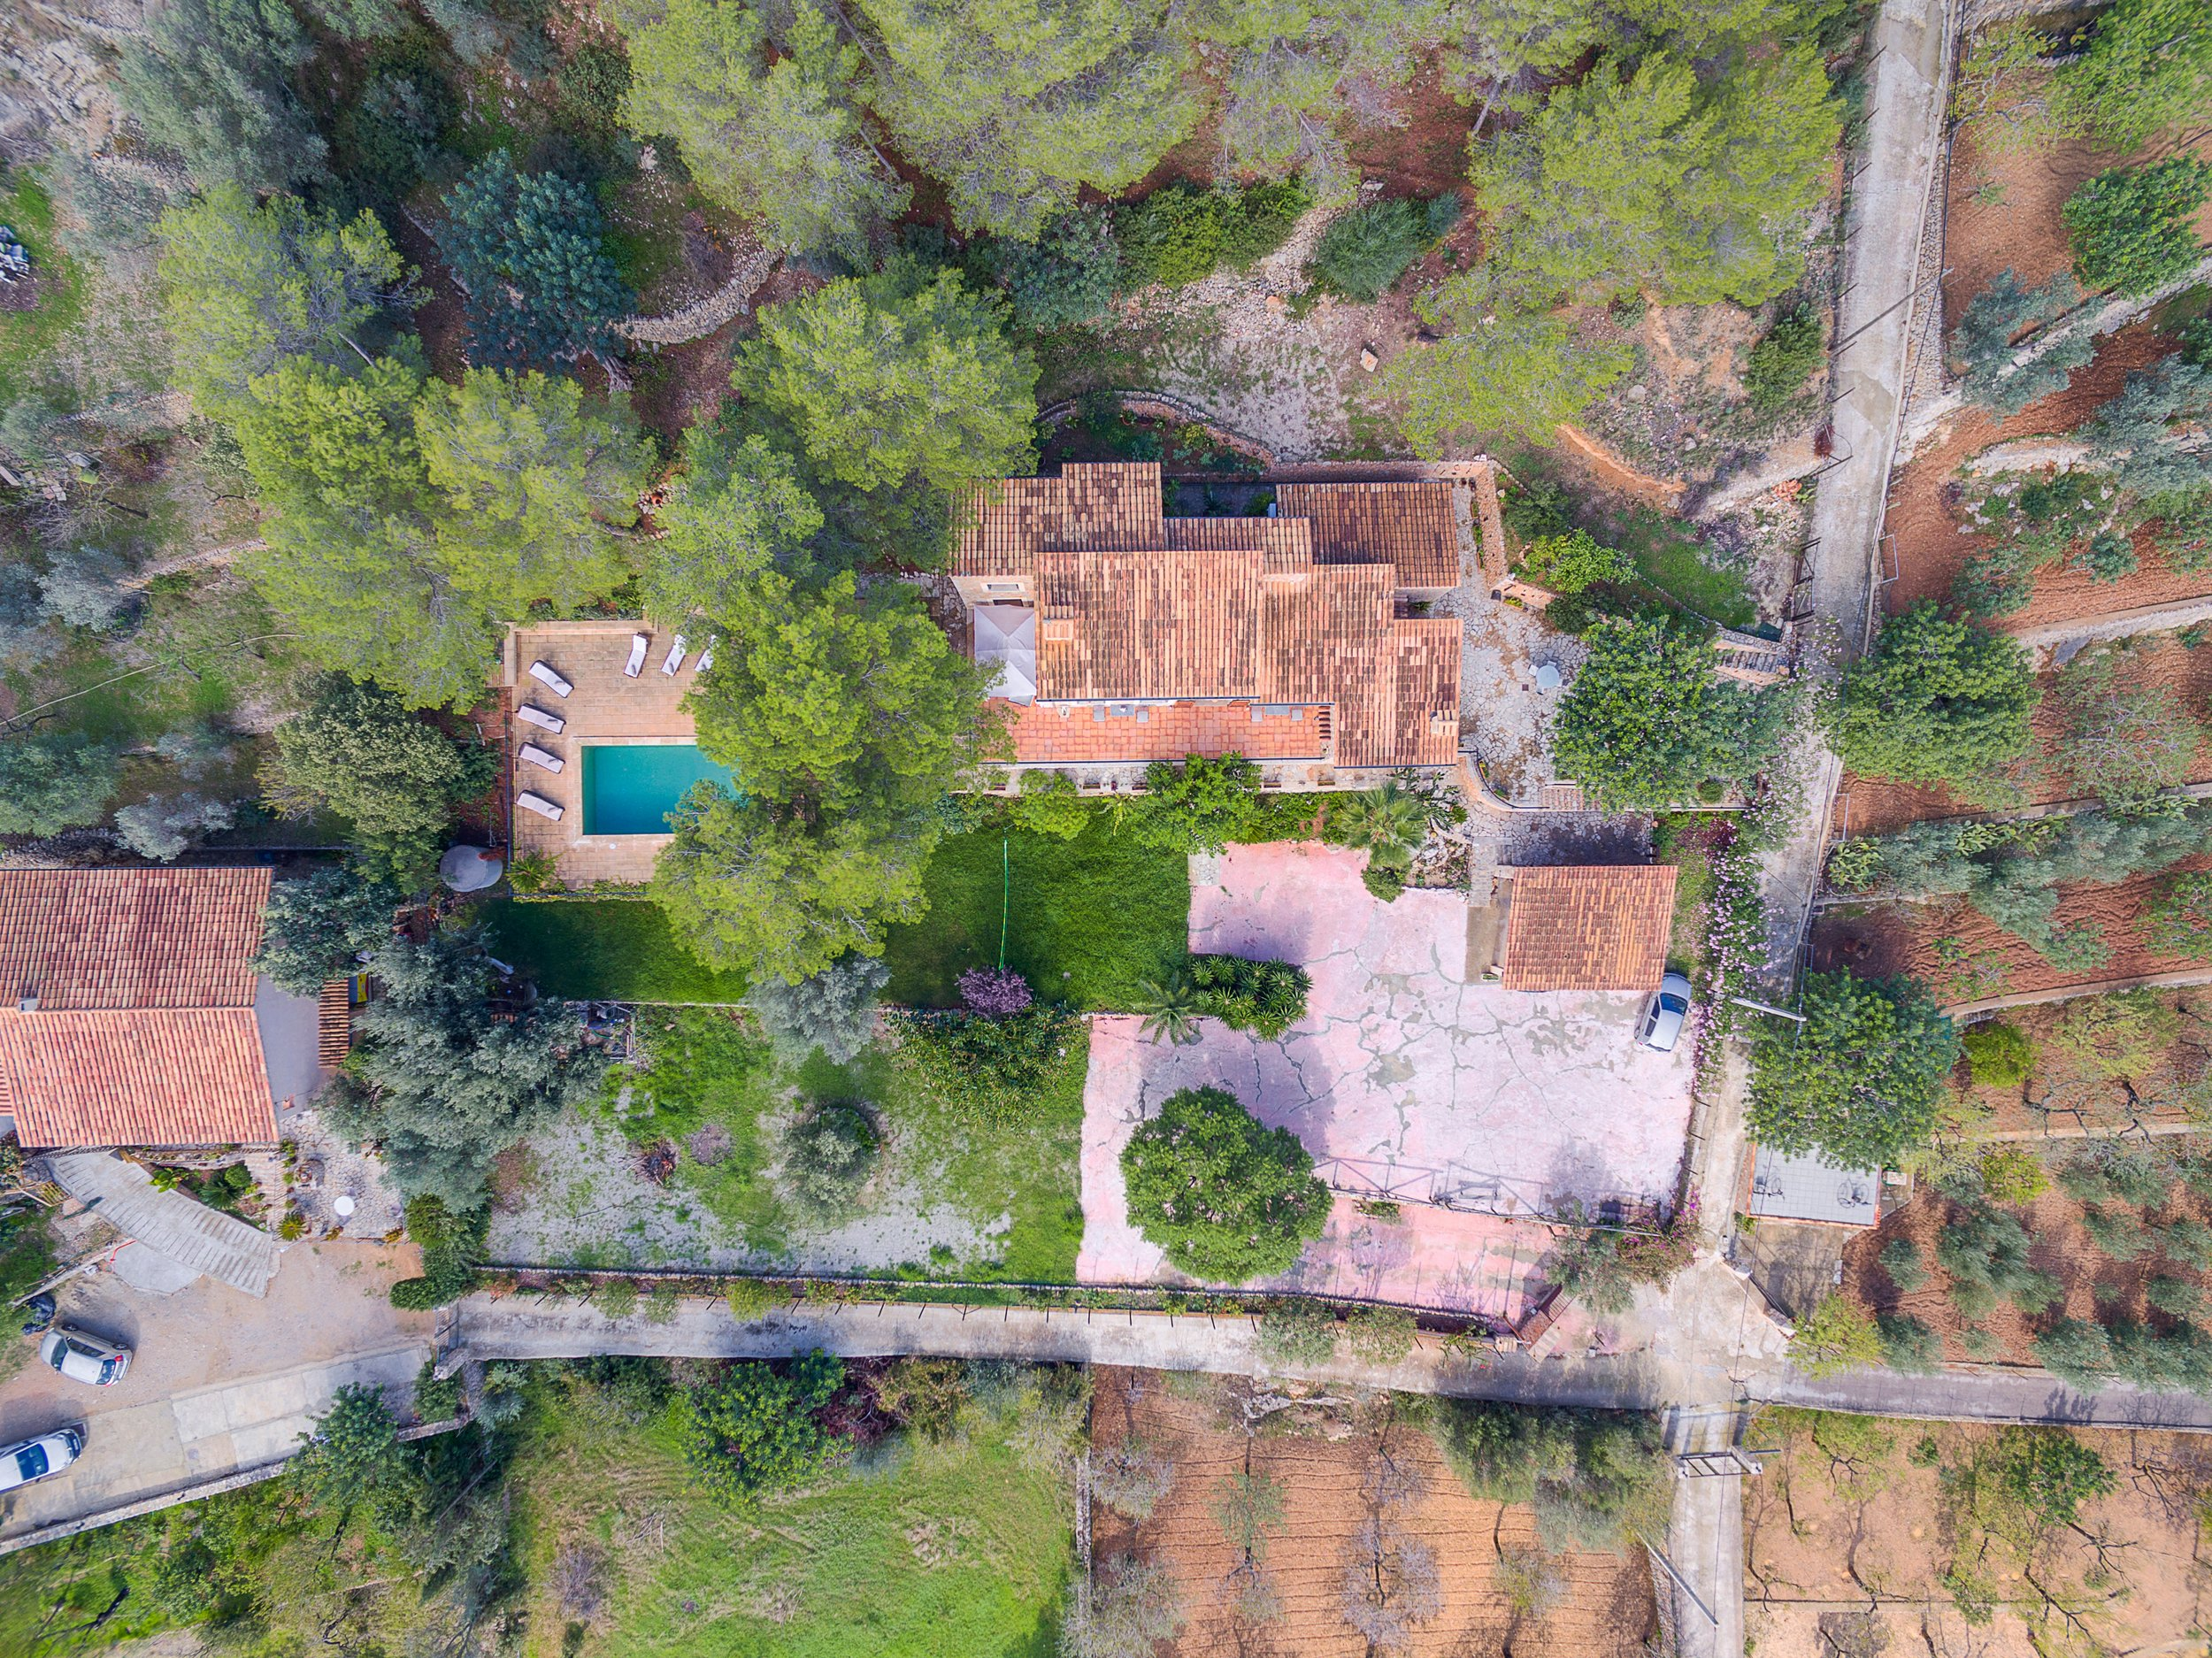 Maison de vacances Villa Cirera in Alaro (2611793), Alaro, Majorque, Iles Baléares, Espagne, image 29